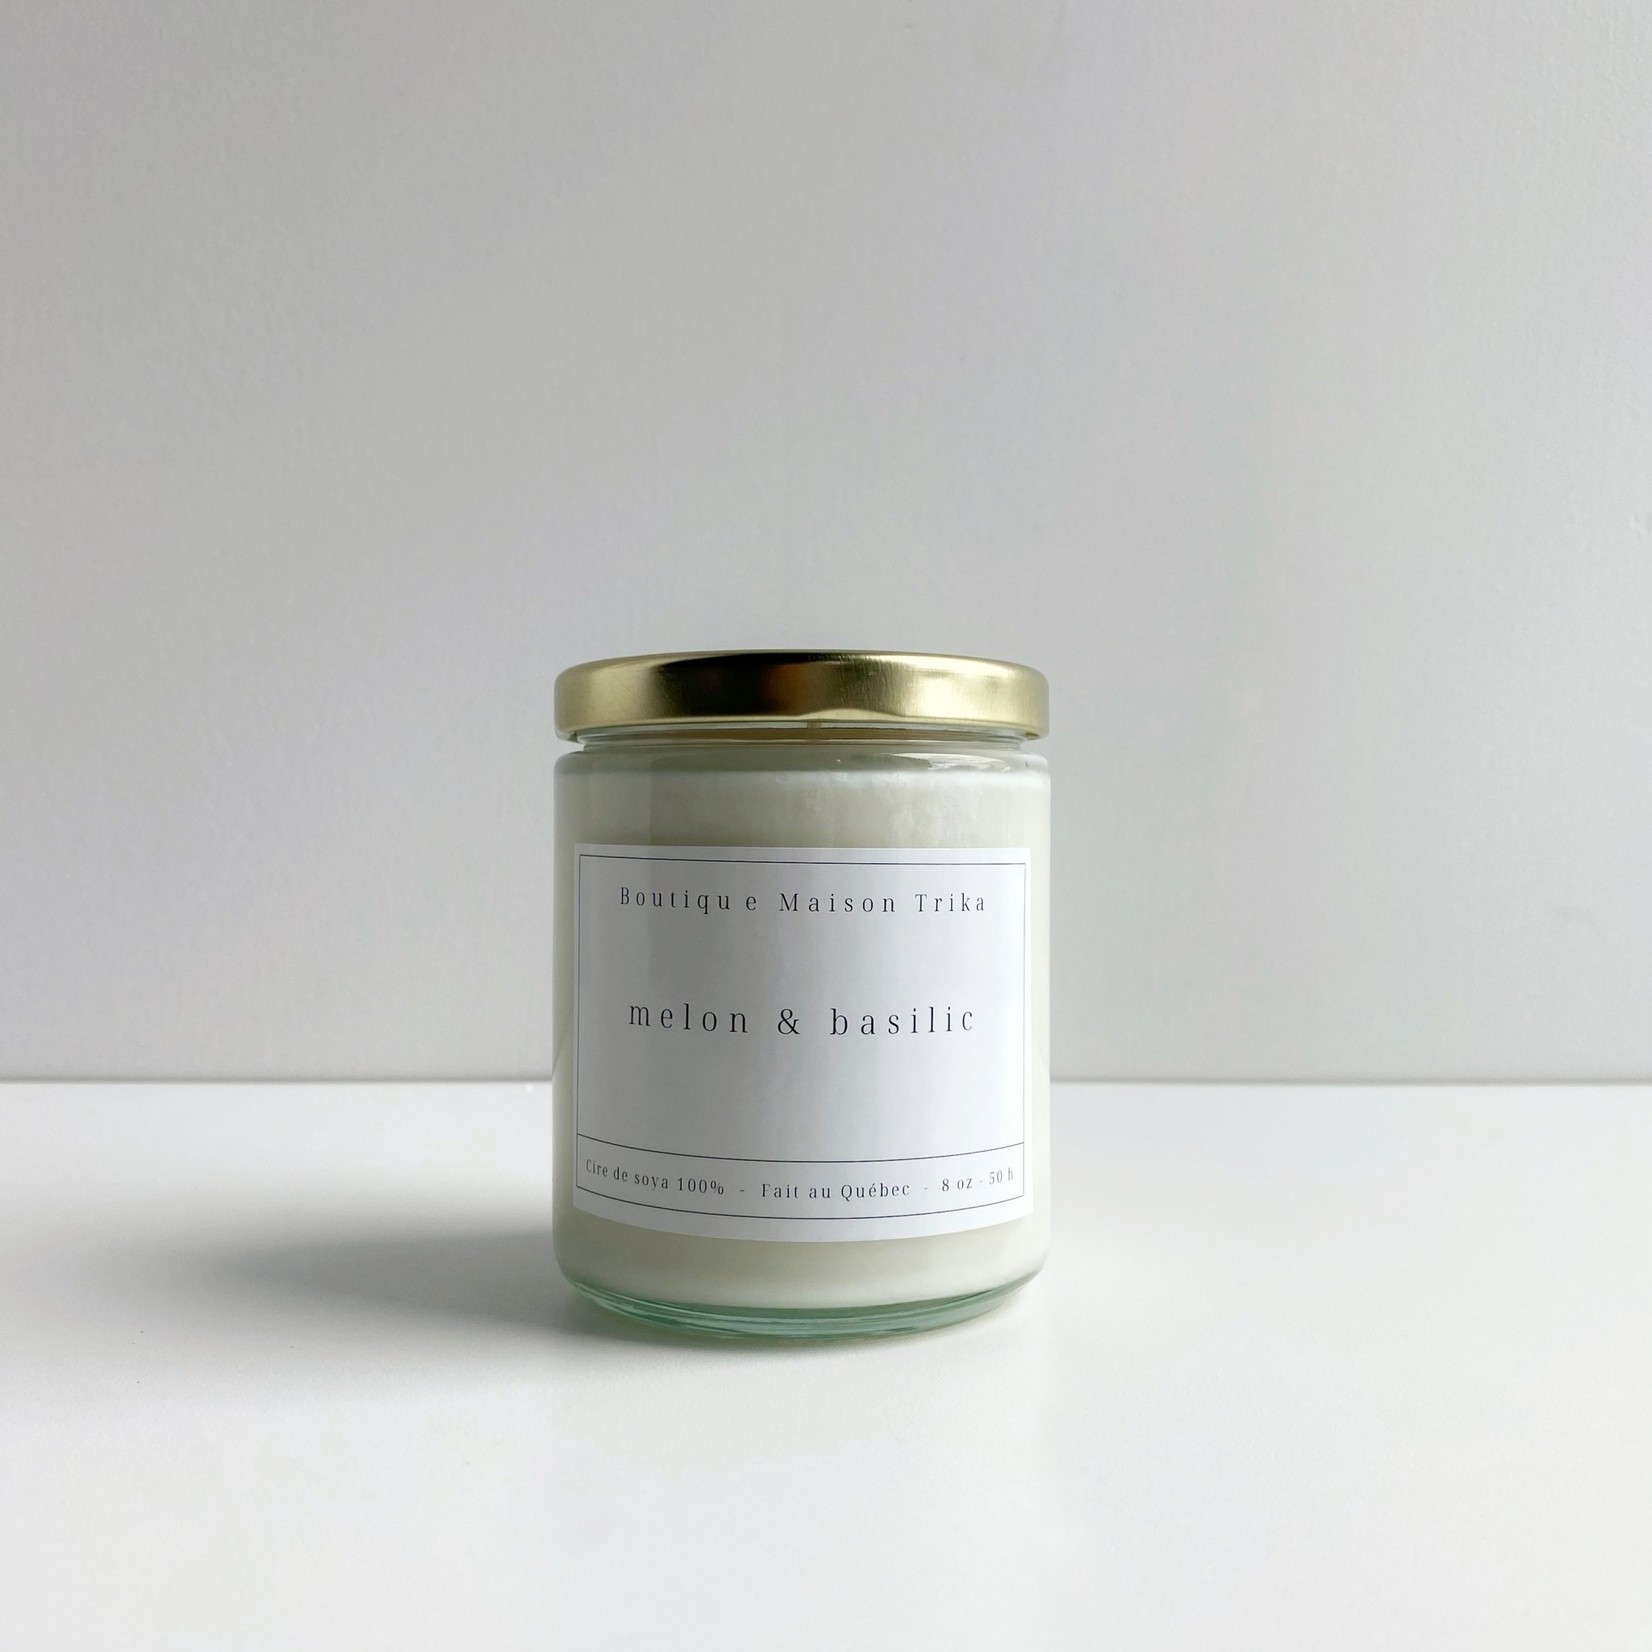 Maison Trika bougie - Melon & basilic